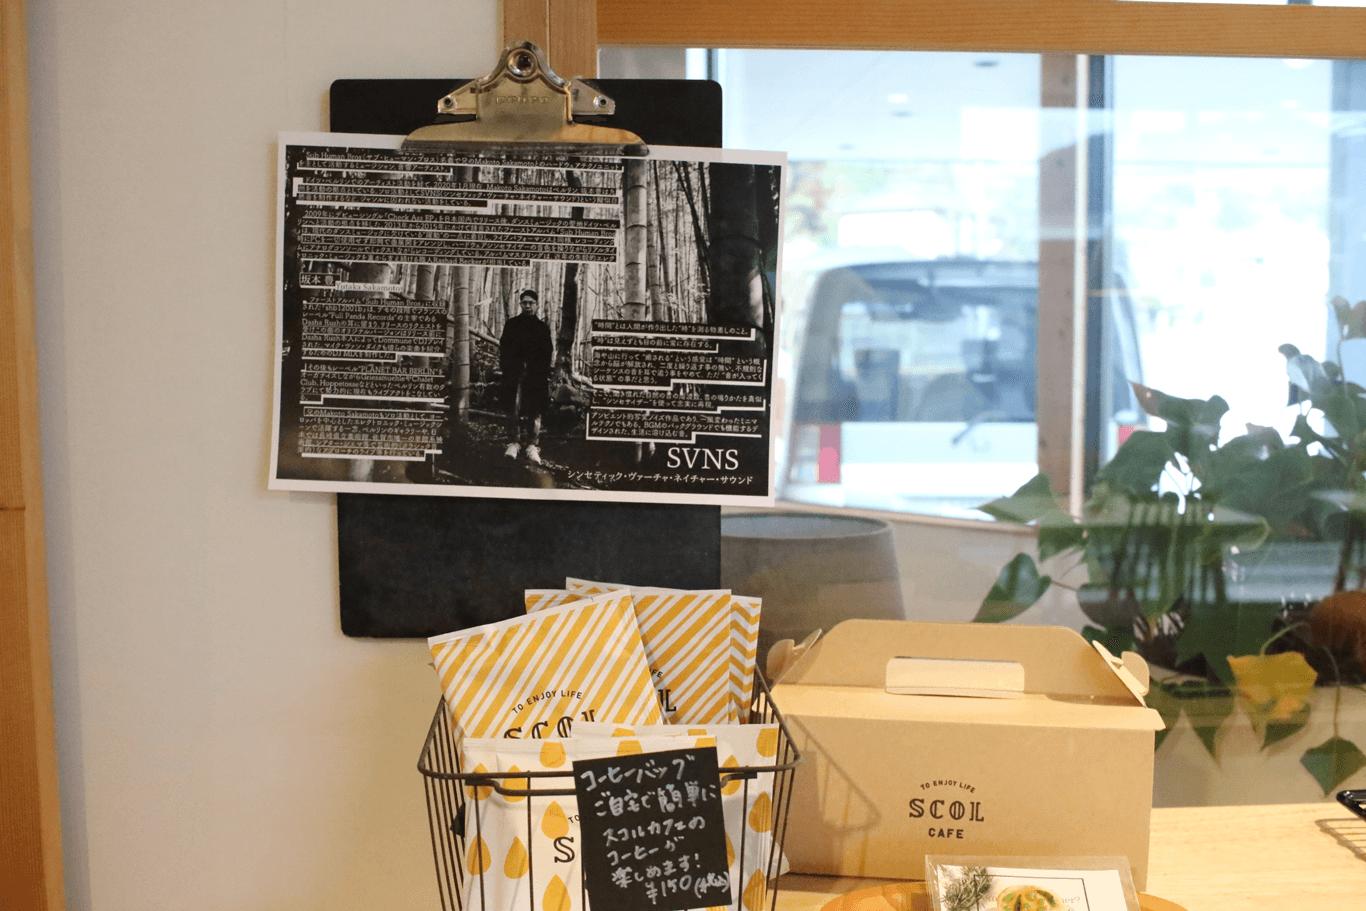 ART|レジデンス事業|多久市|SCOLCAFE|scolcafe01